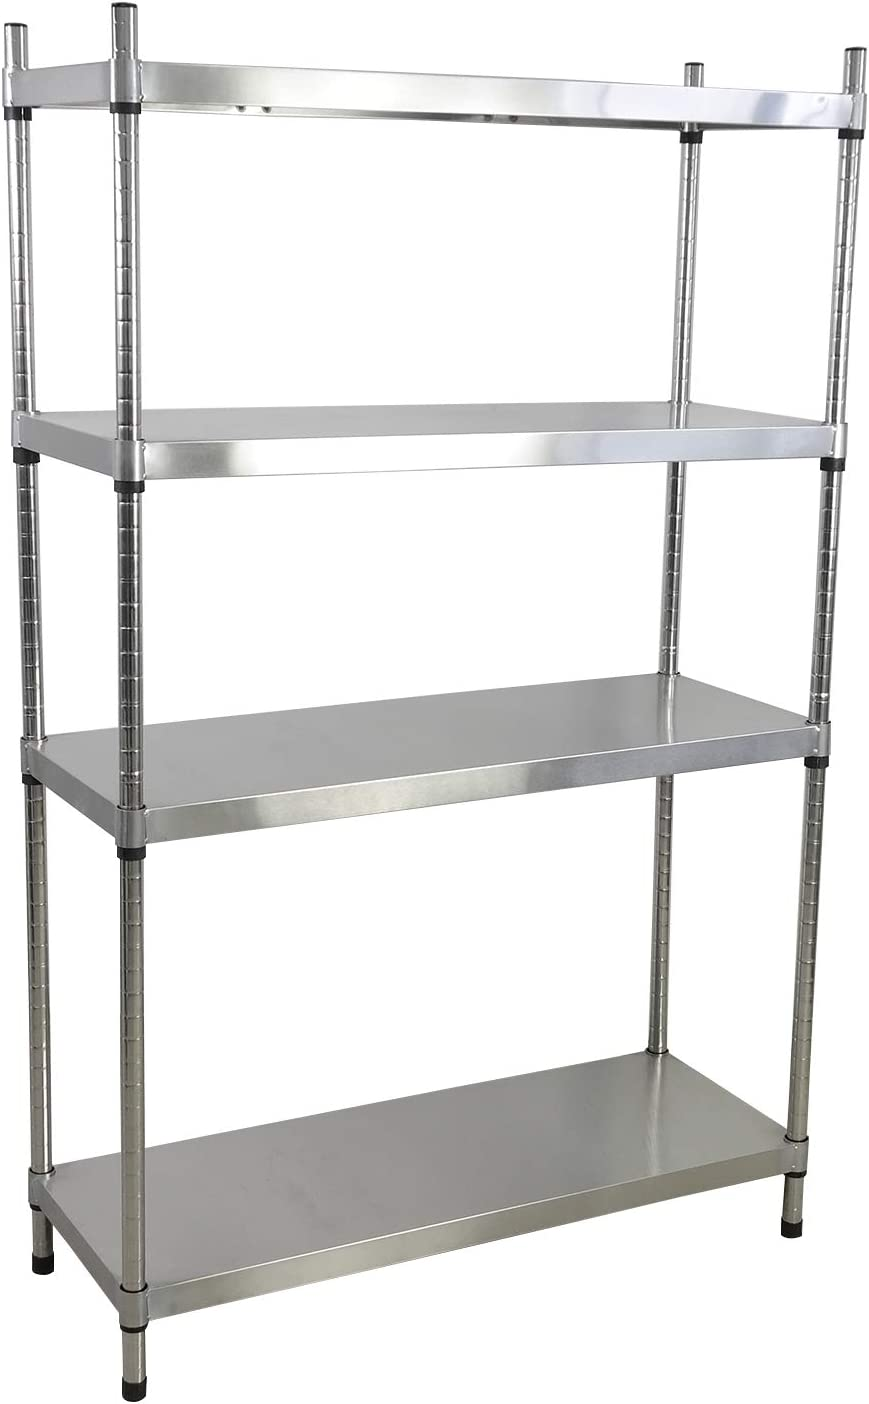 Joyeen 4 Tier Adjustable Shelves, Stainless Steel Shelving Unit, Adjustable Storage Shelves Racks